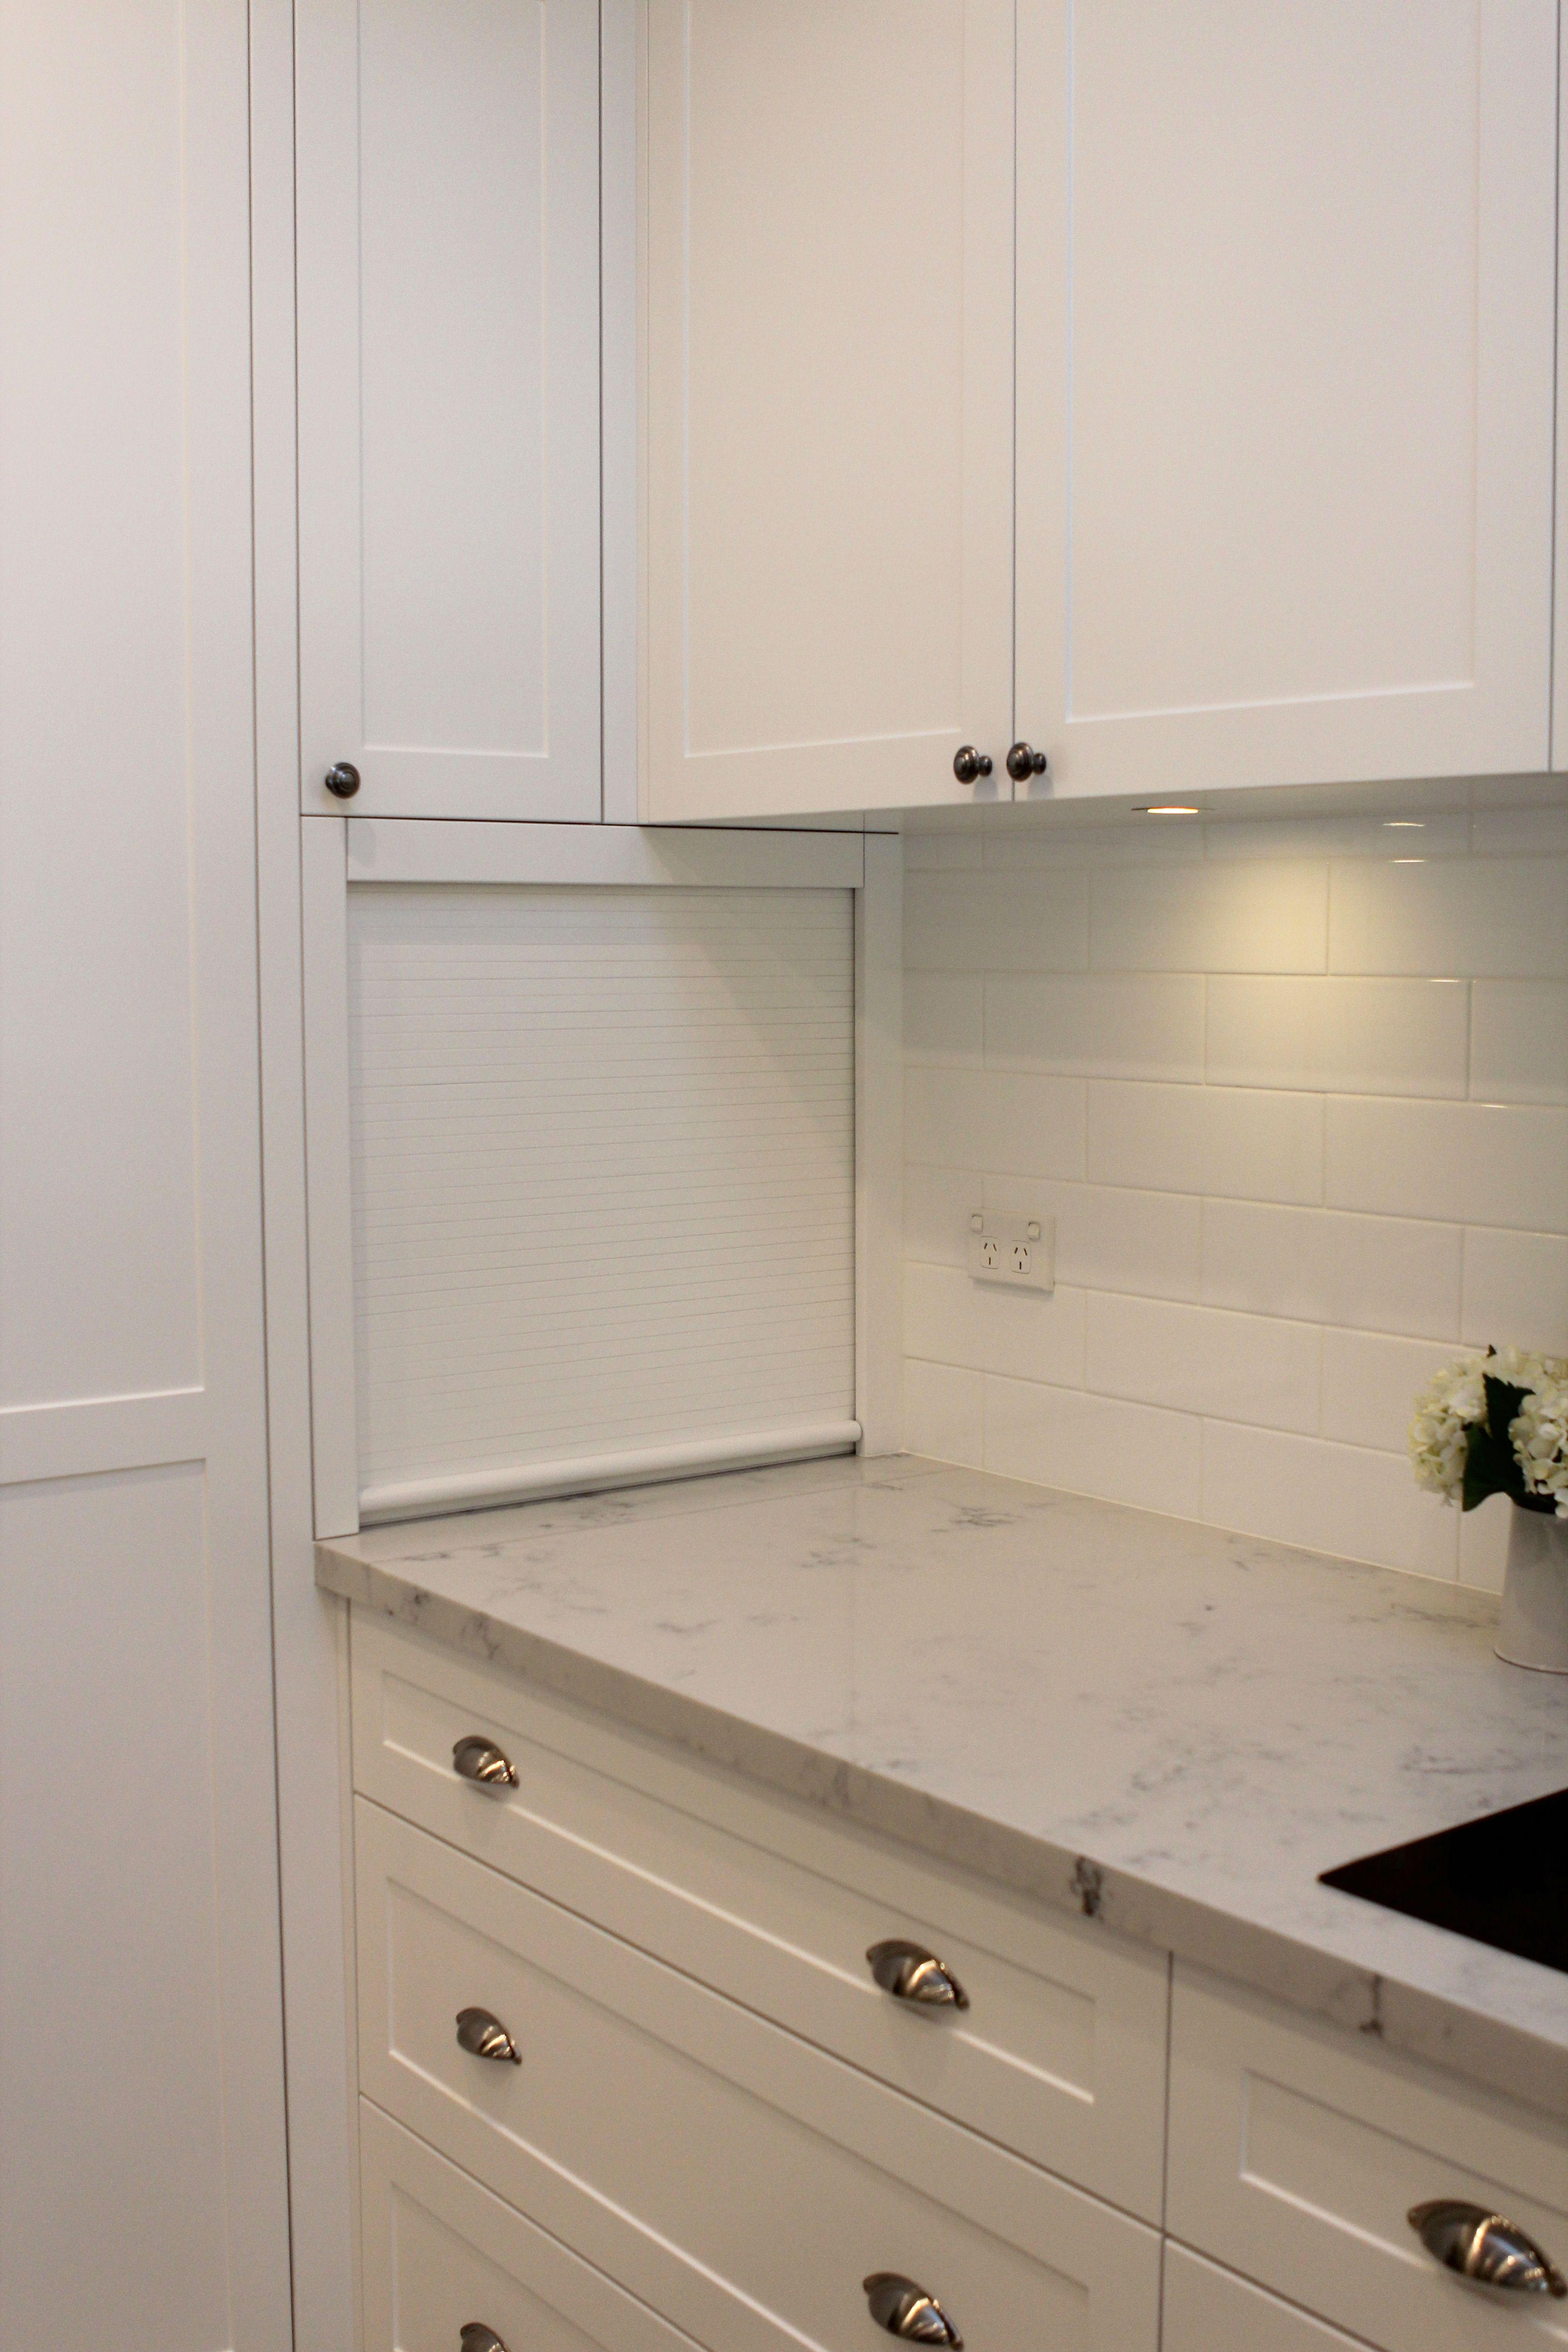 Kitchen Roller Door Appliance Cupboard Used The Quot Dead